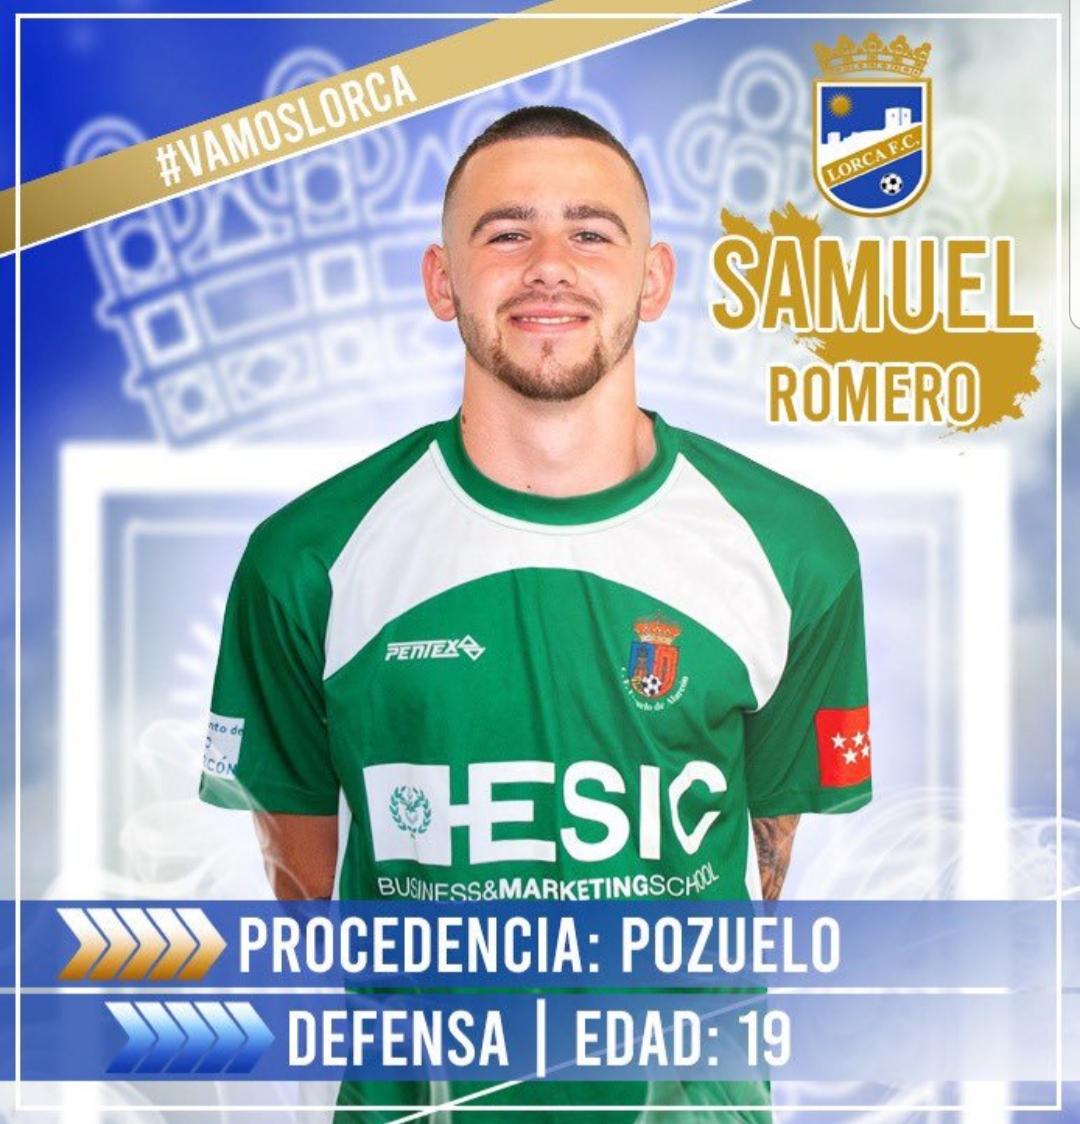 PRESENTACION SAMUEL.